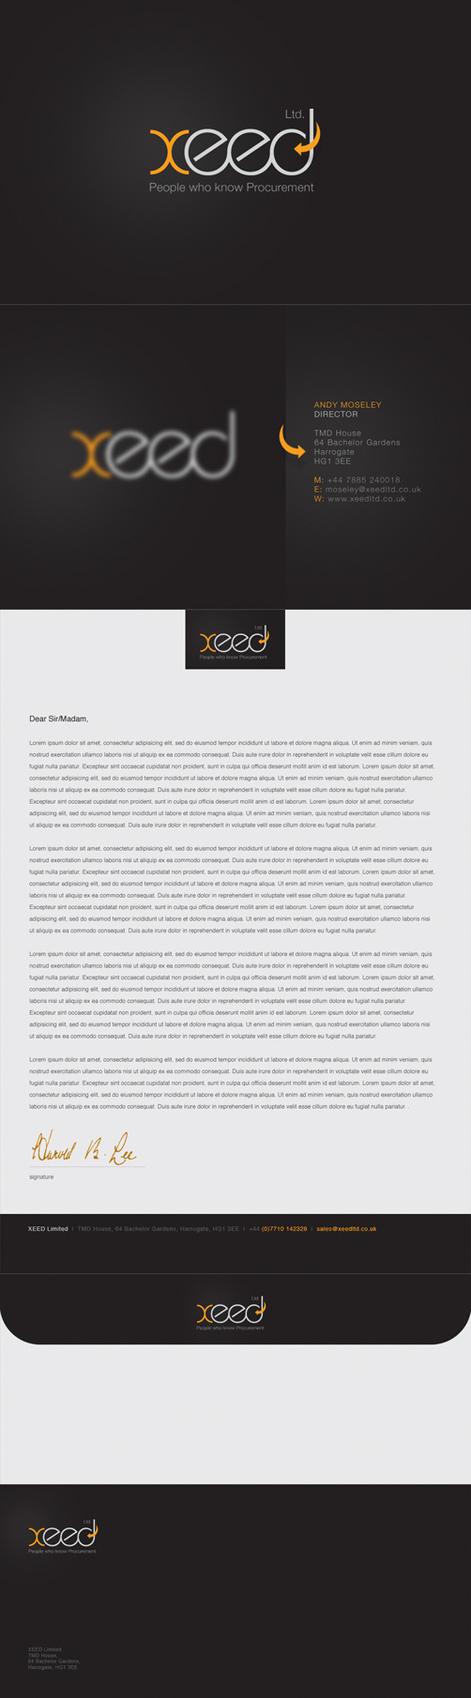 XEED - Print Set by detrans